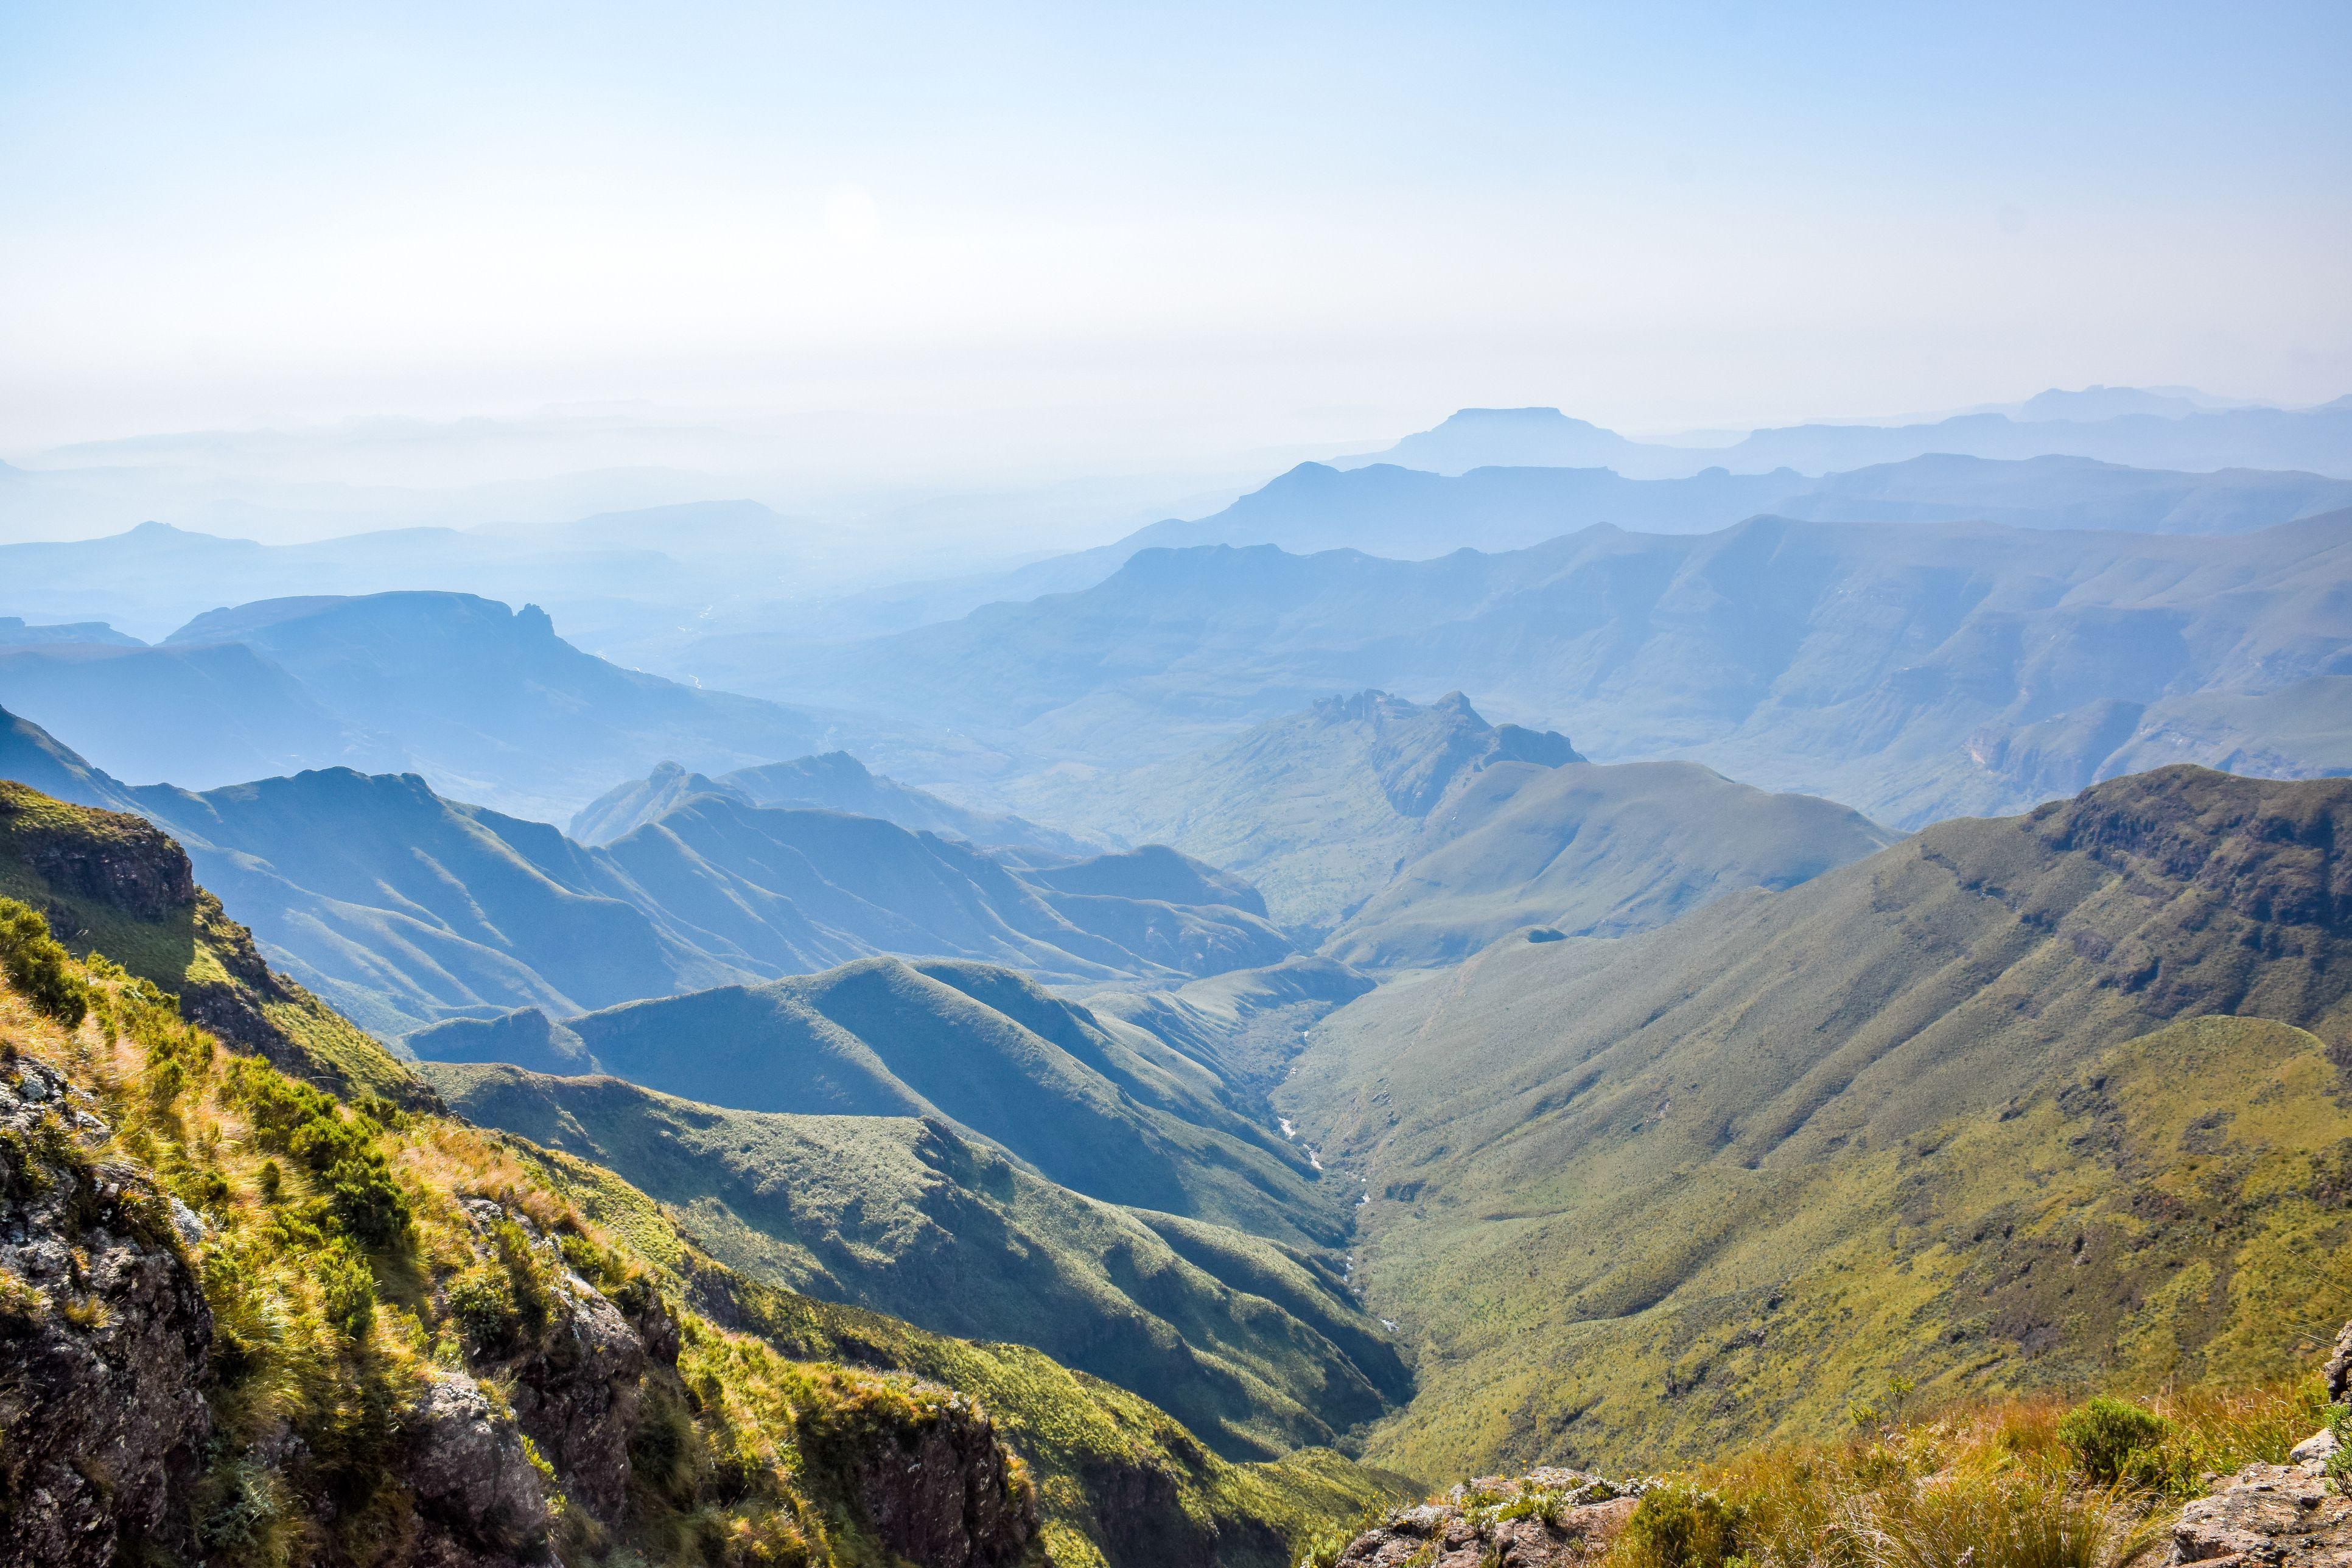 View of the Drakensberg Mountains